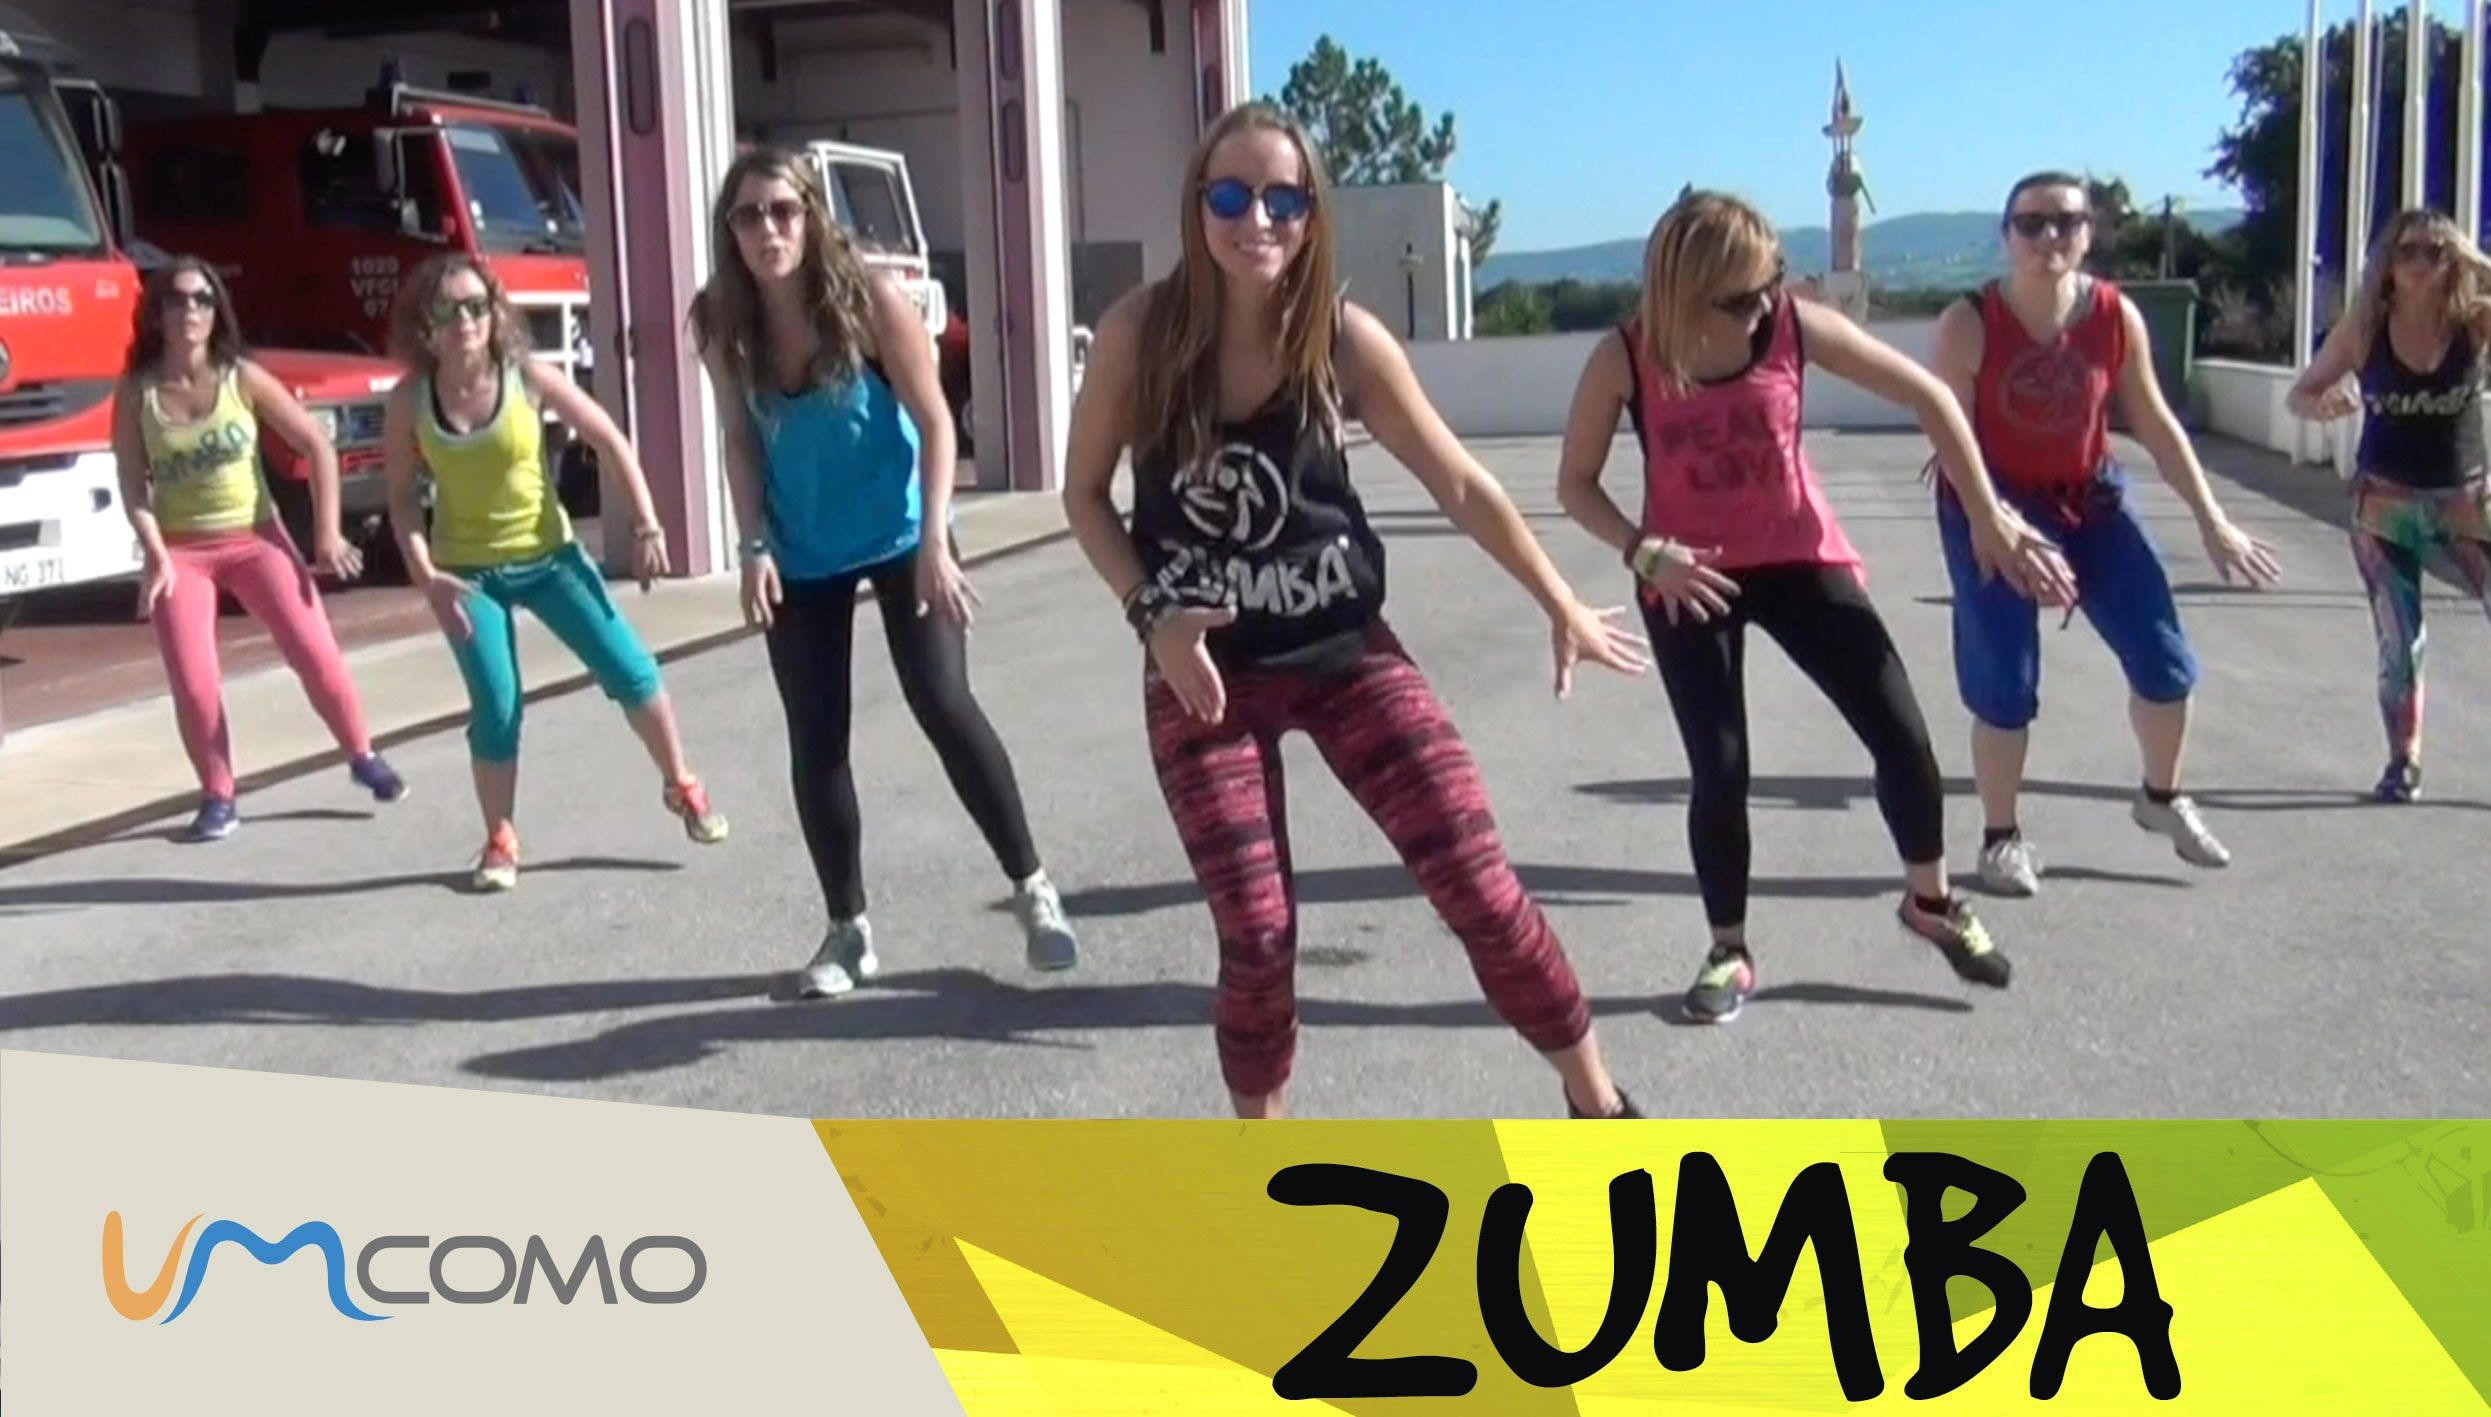 Aula De Zumba Enrique Iglesias Mit Bildern Zumba Fitness